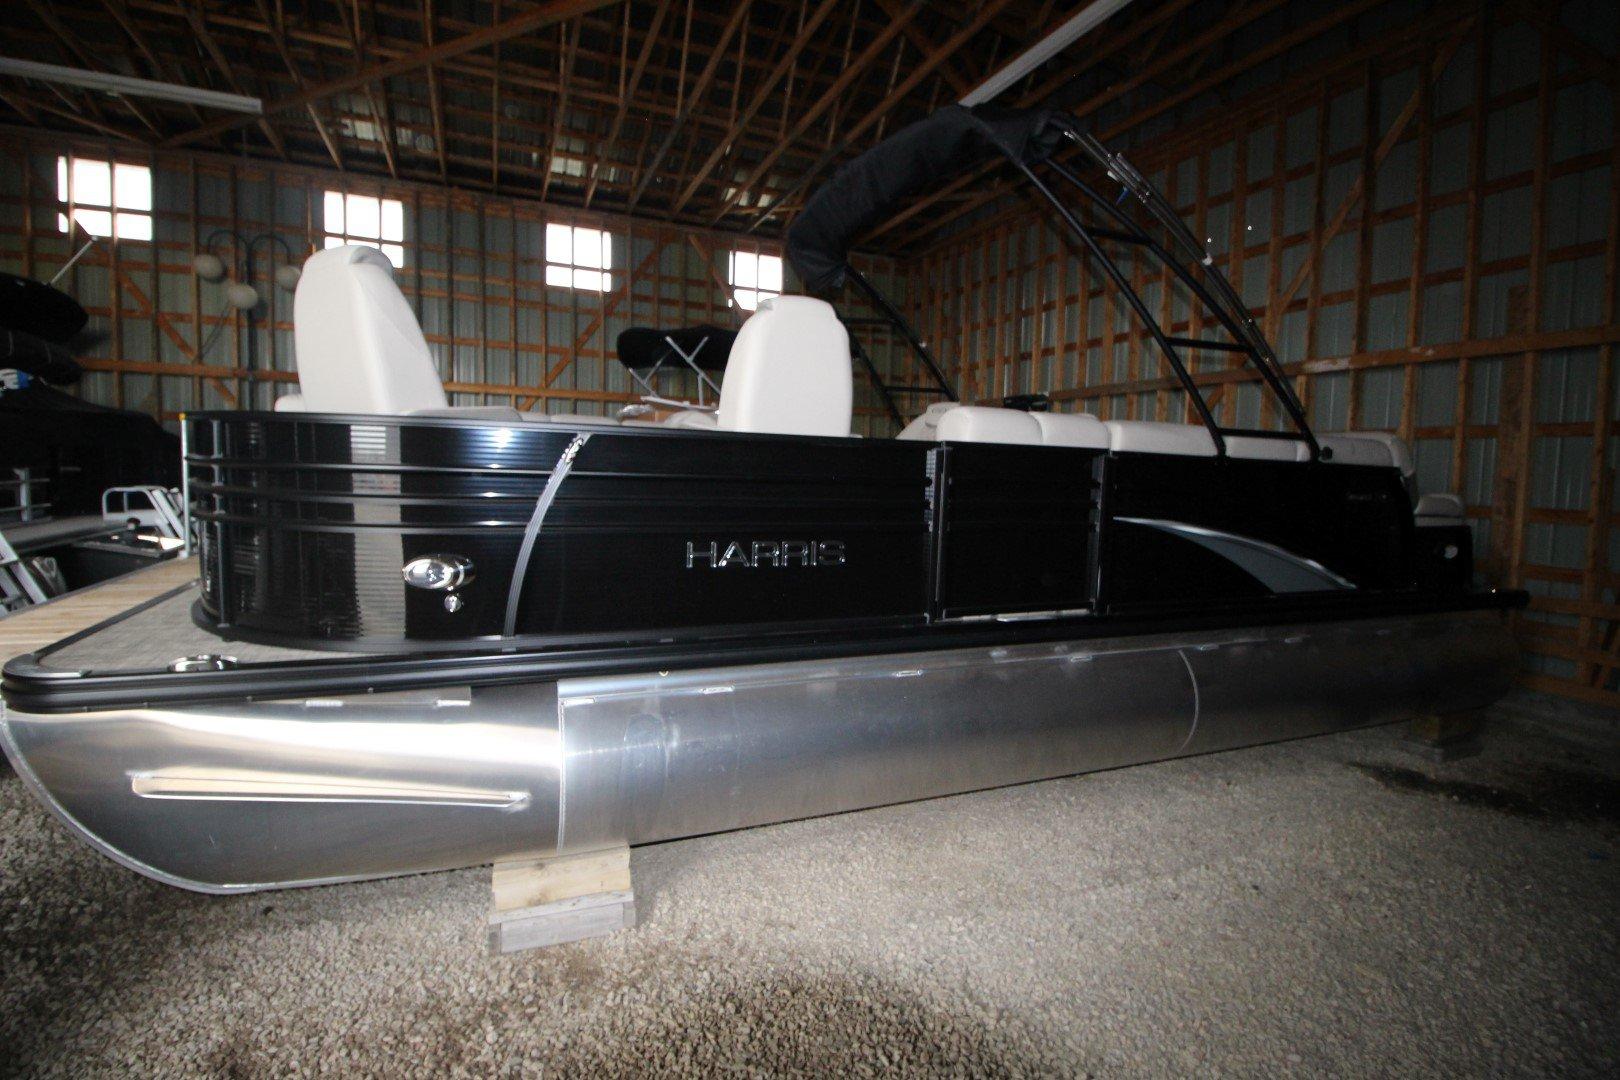 Harris Sunliner 220 - IMG_2743